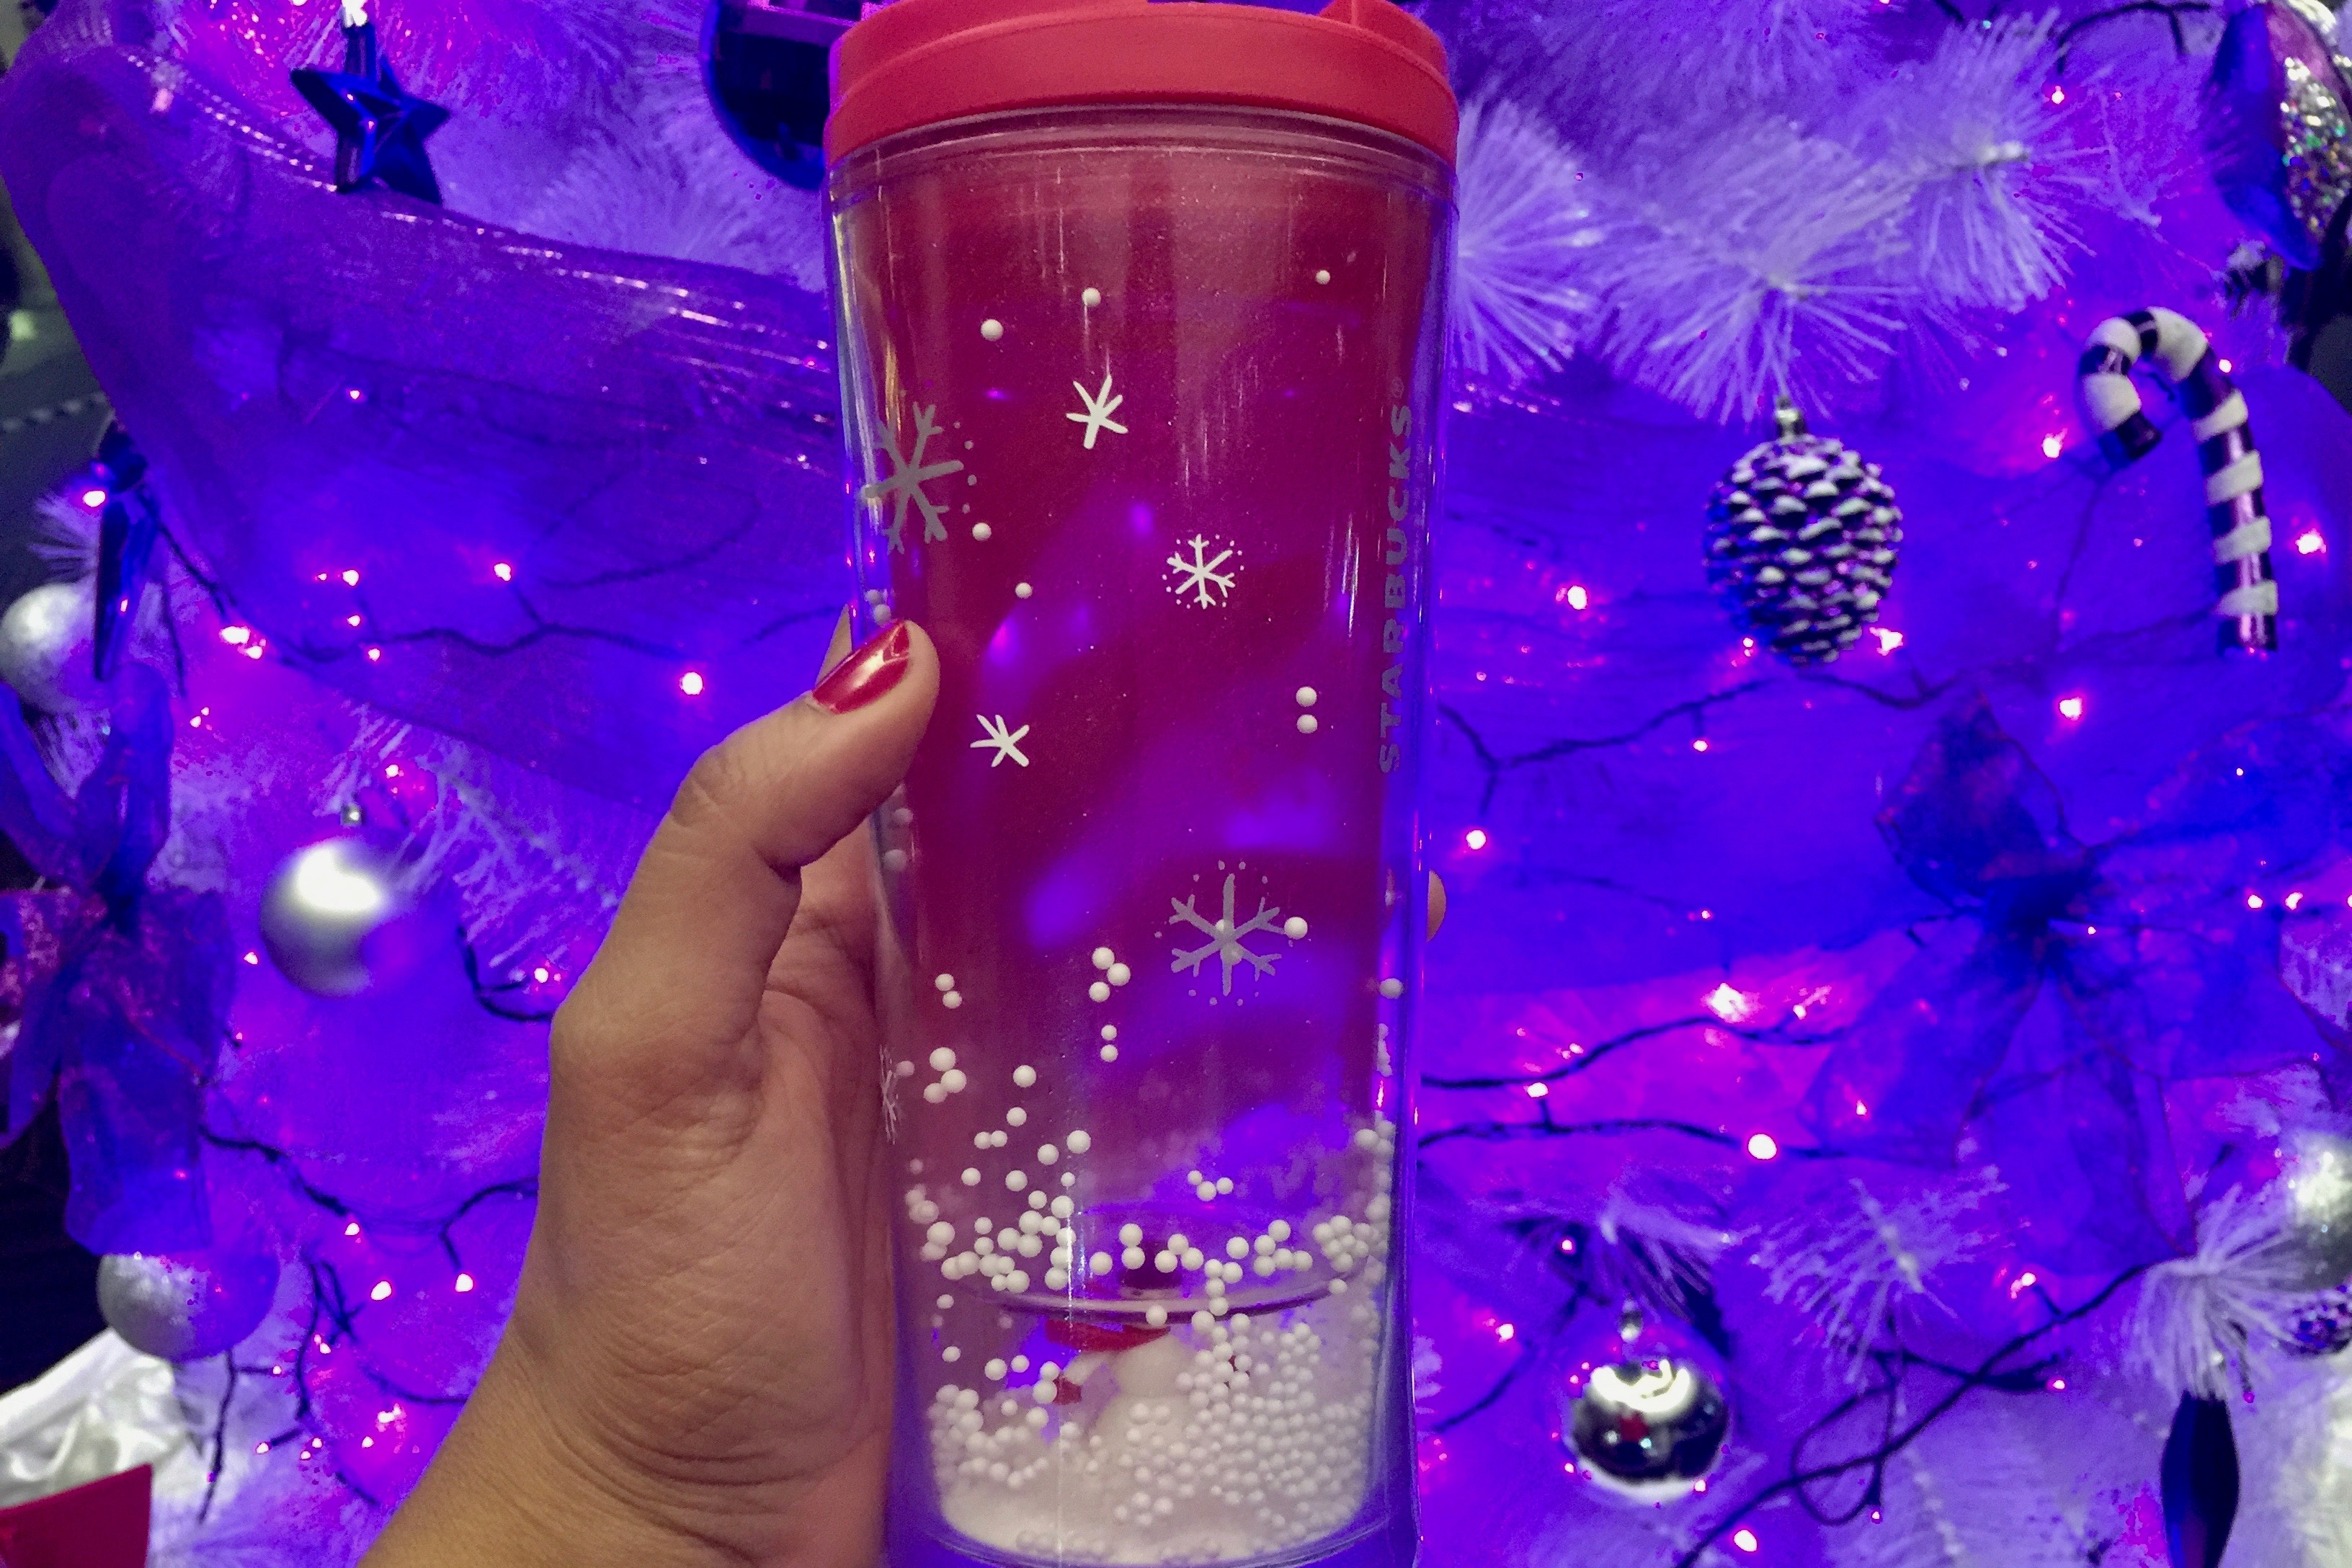 Christmas Gift Starbucks Tumblr